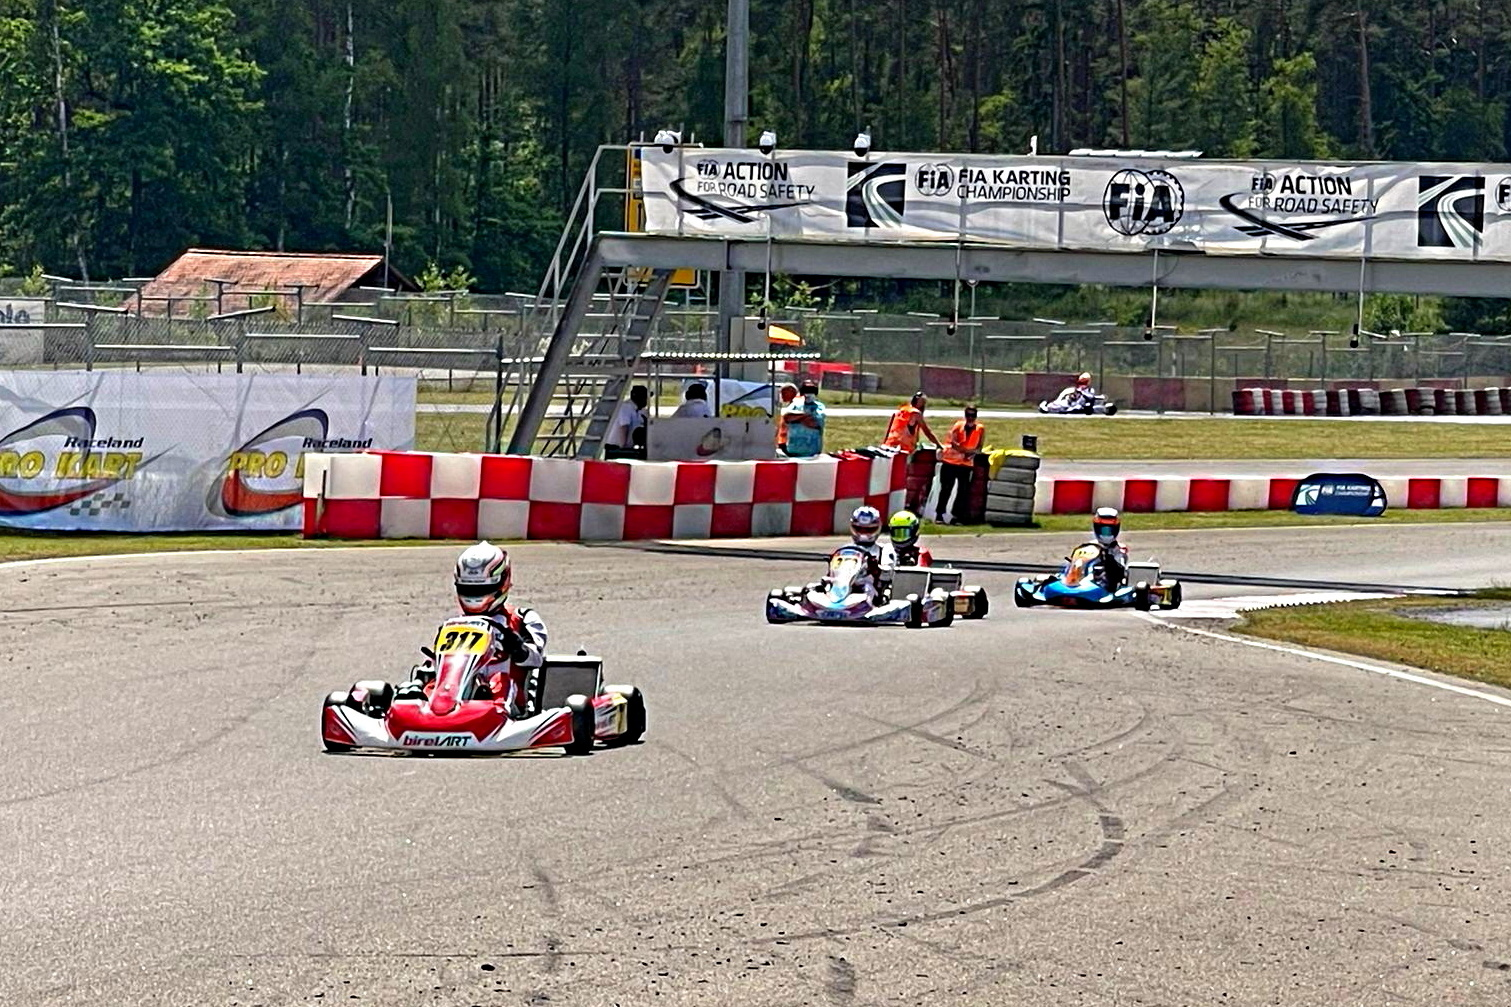 Europeo KZ/KZ2 y Academy Trophy: qualifying disputado en Wackersdorf